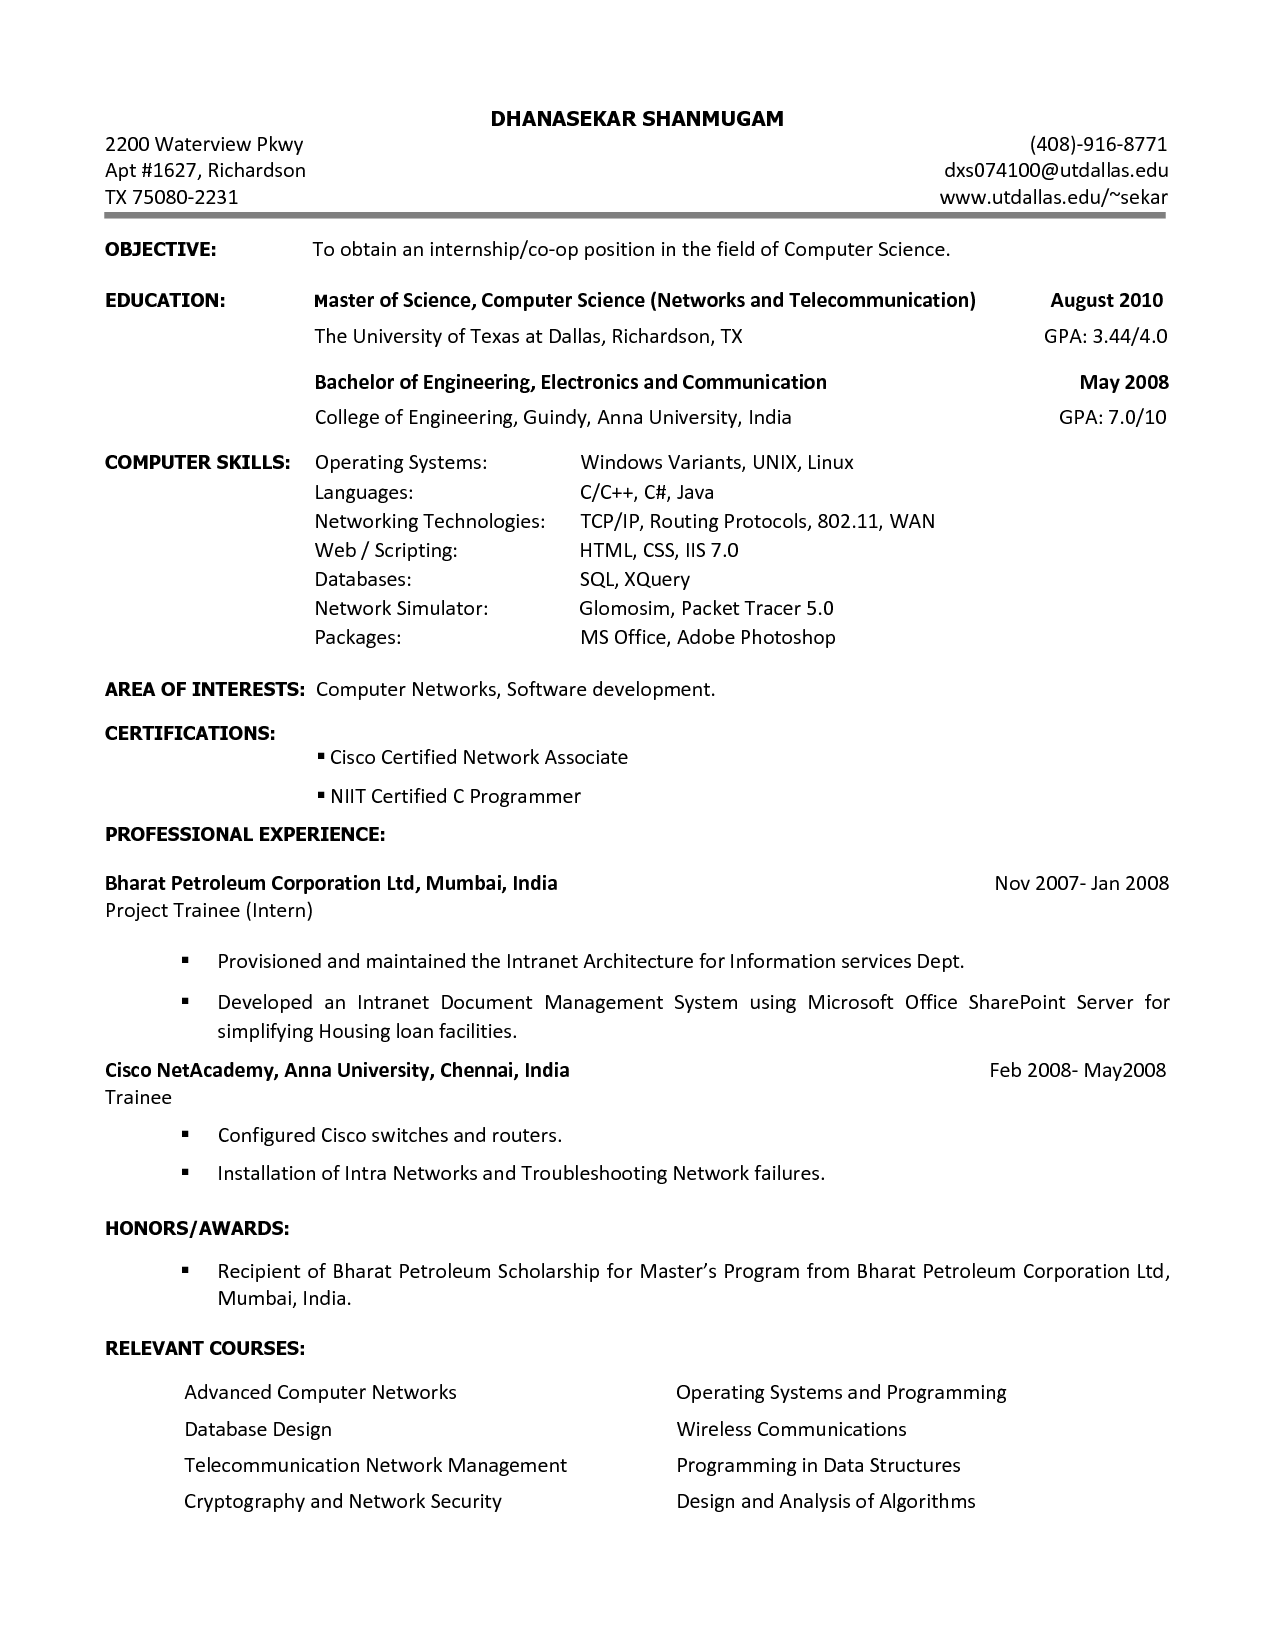 My Cv Resume Maker